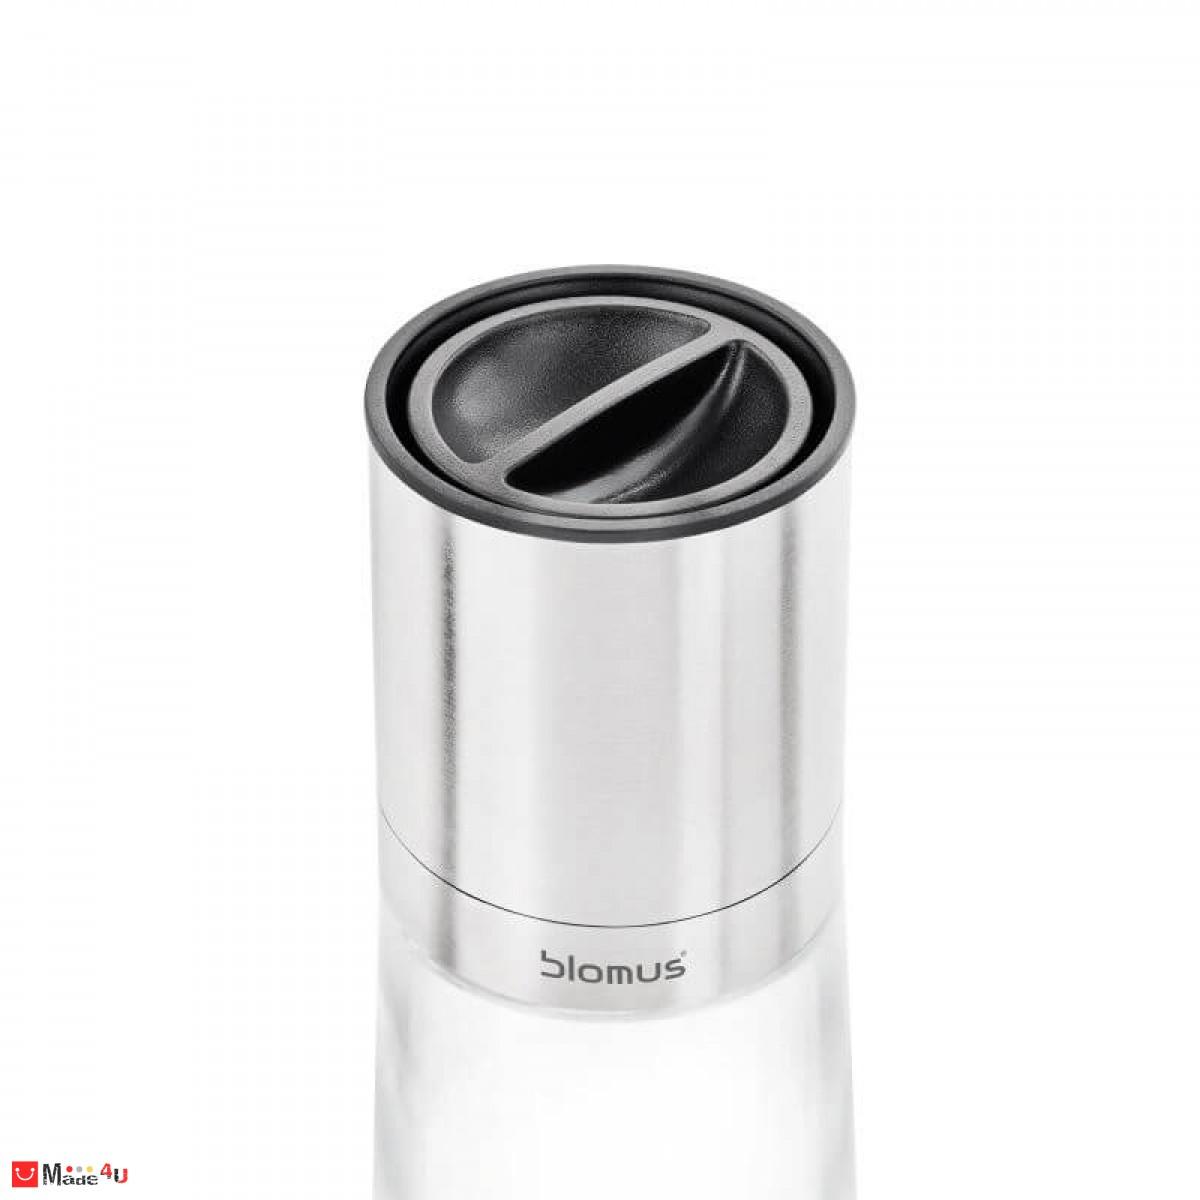 Мелничка за сол или пипер с керамичен механизъм PEREA 18,2см - марка BLOMUS